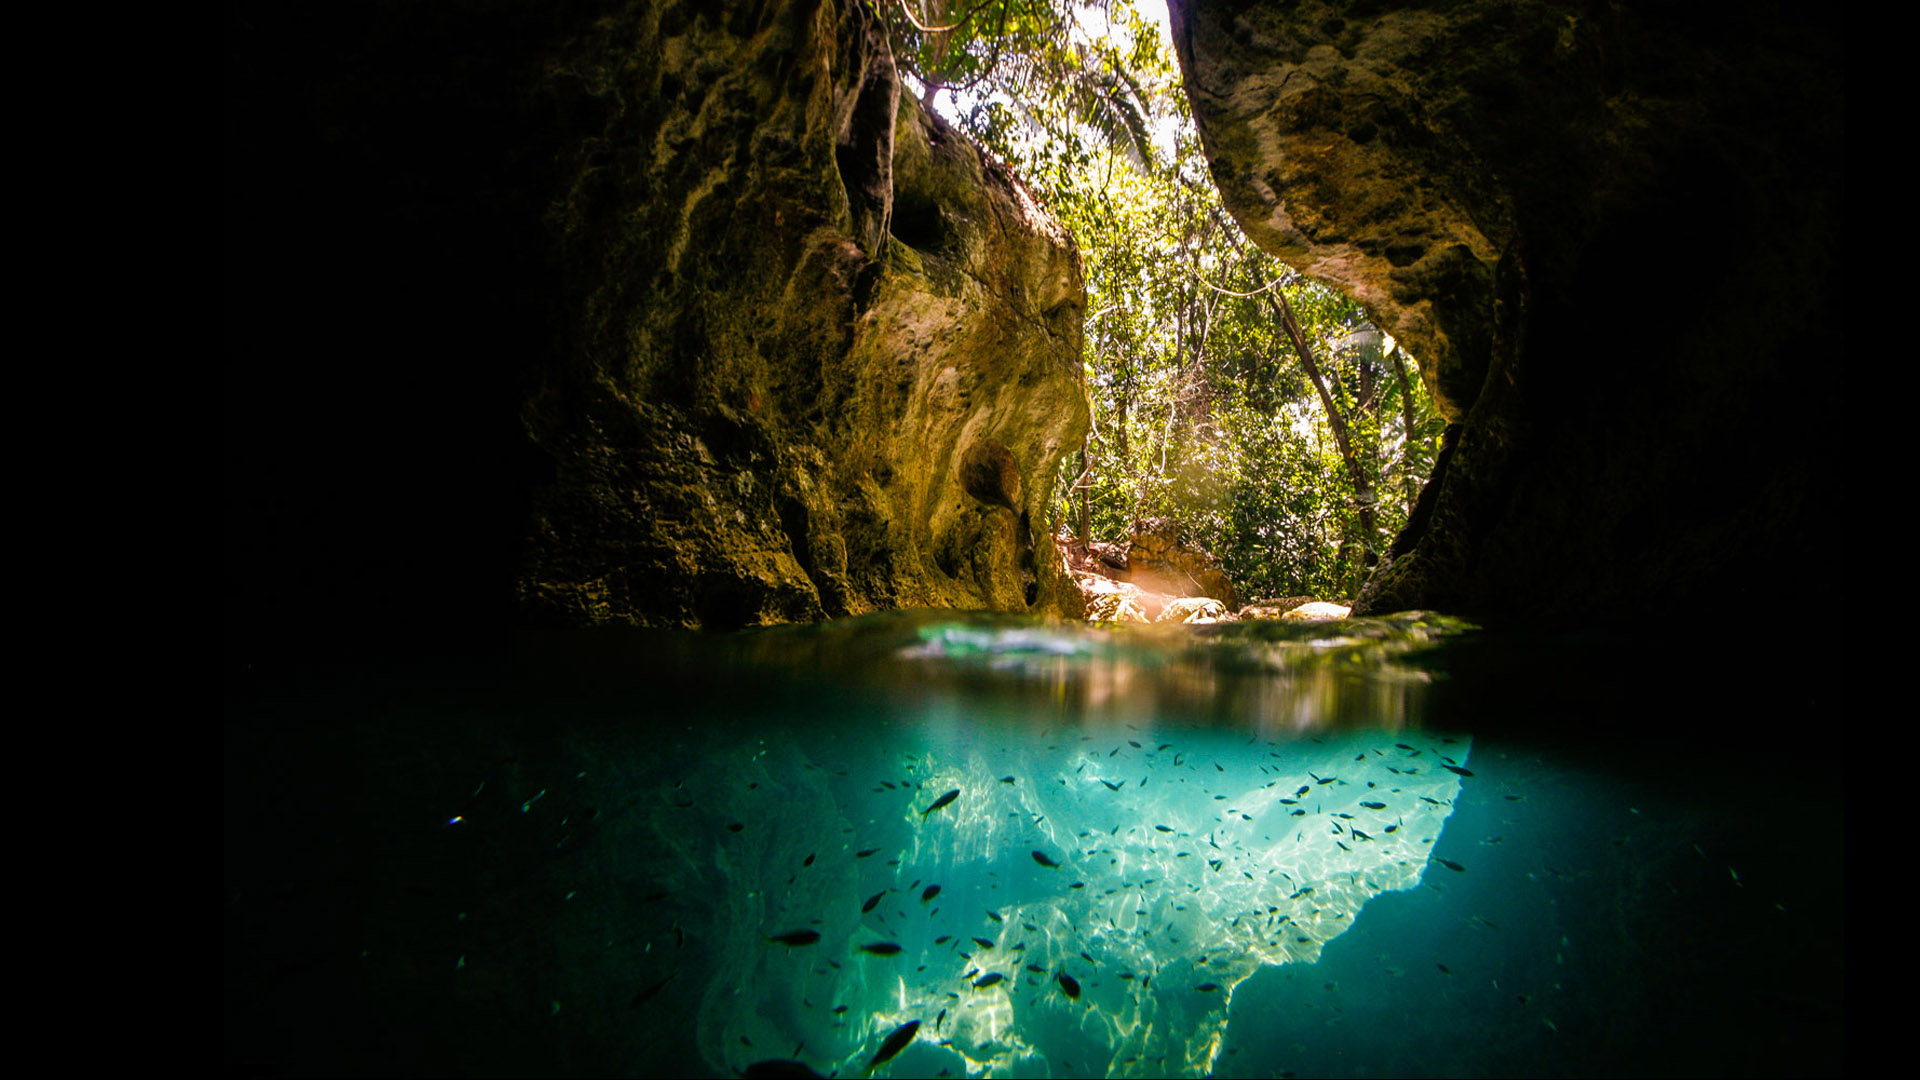 Cave of the Crystal Sepulchre in Belize [1920x1080] iimgurcom 1920x1080